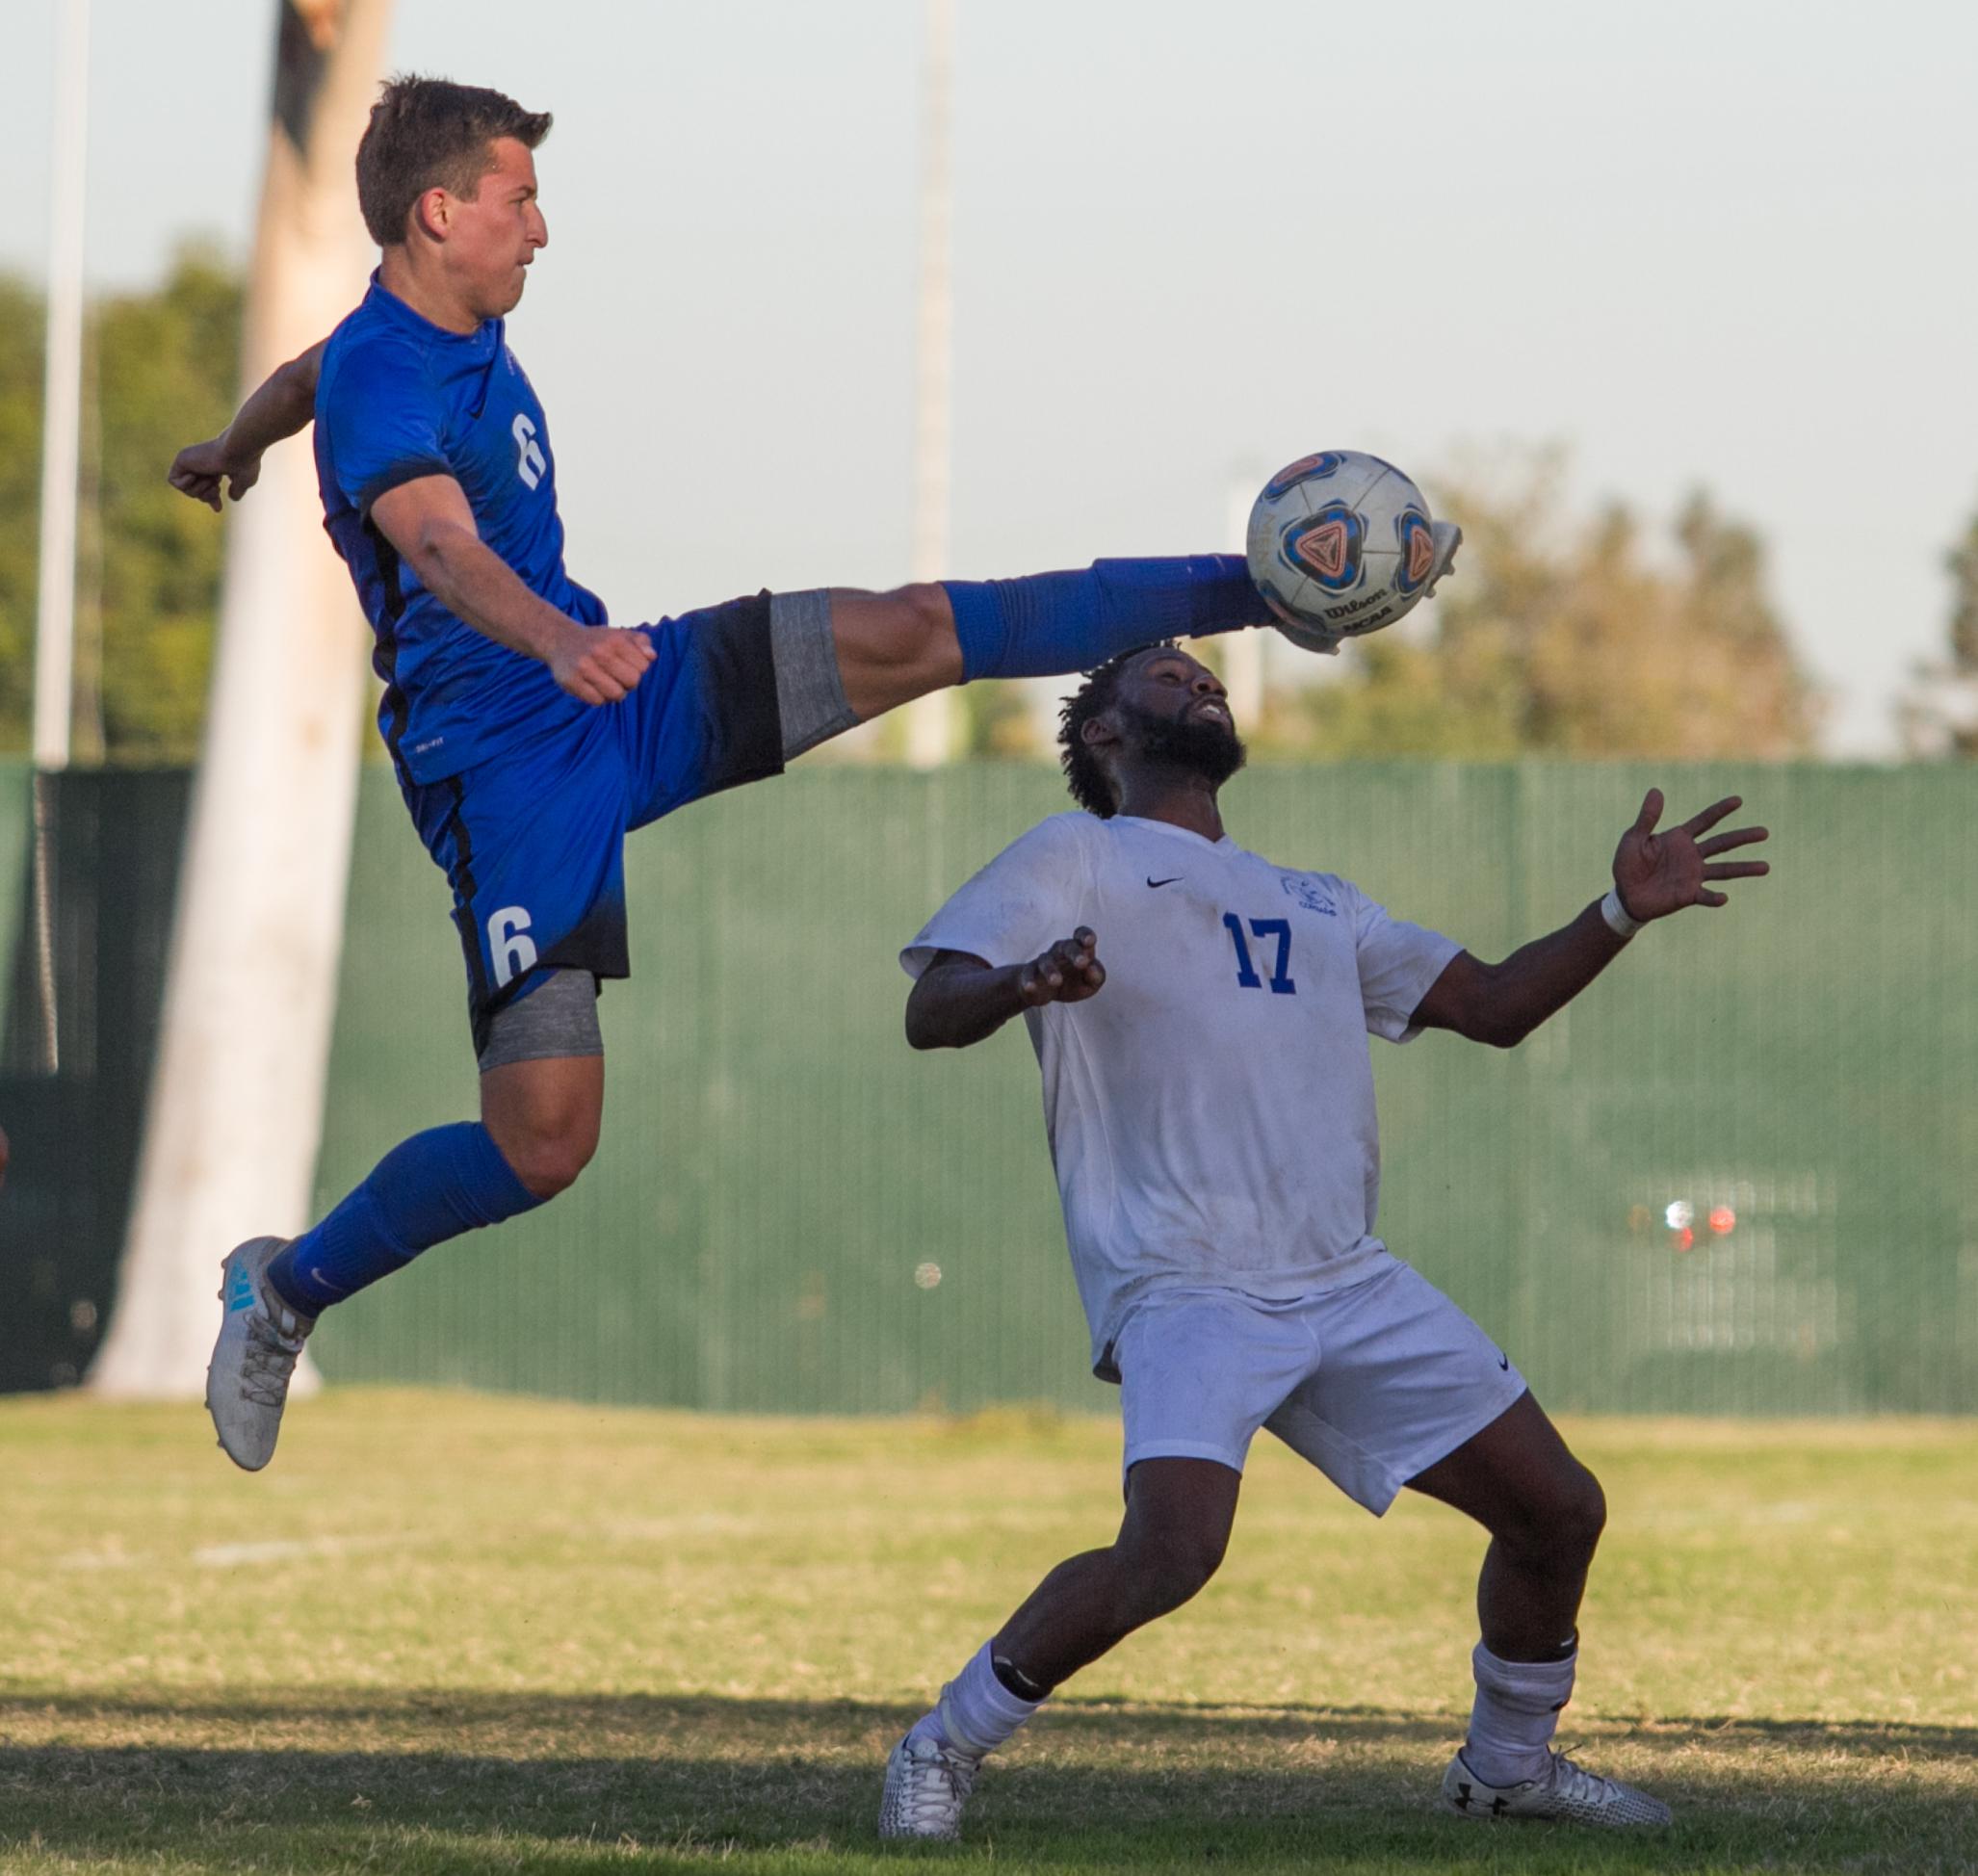 Santa Monica College Corsair Cyrille Njomo (17)(R) contests the ball against Cerritos College Falcon Esteban Camacho (6)(L) on Wednesday, November 22, 2017, at Cerritos College in Norwalk, California. The Corsairs lose 2-1. (Josue Martinez)